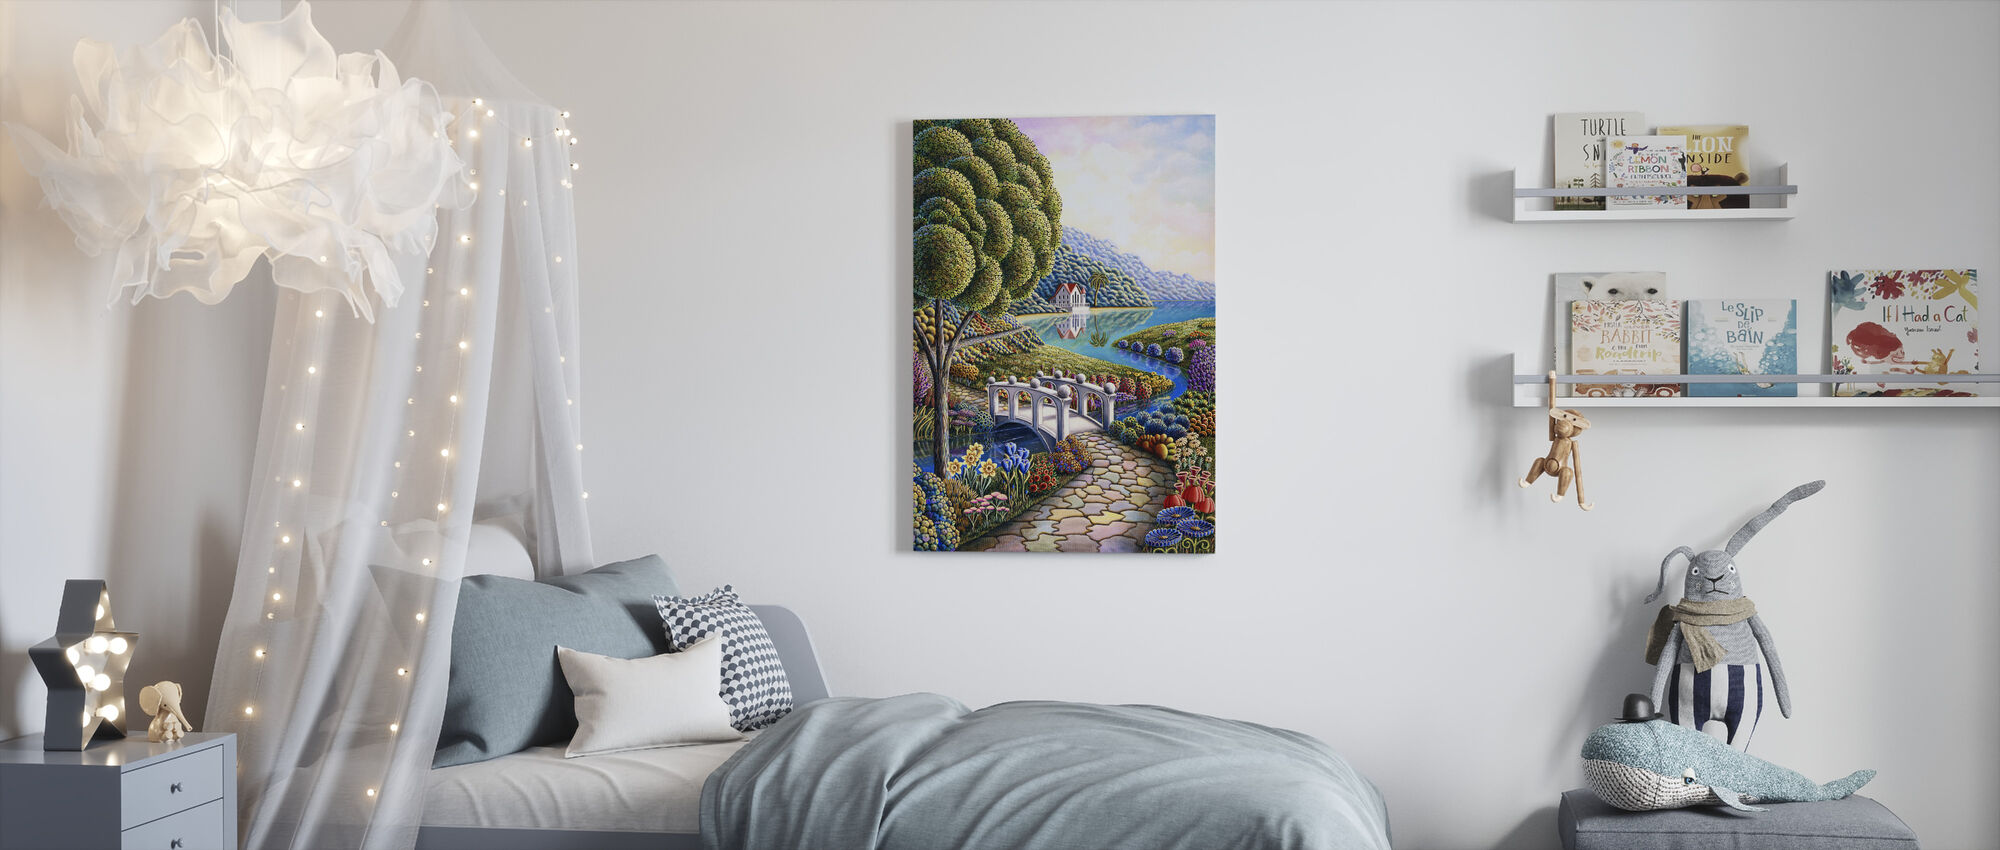 Daffodils - Canvas print - Kids Room